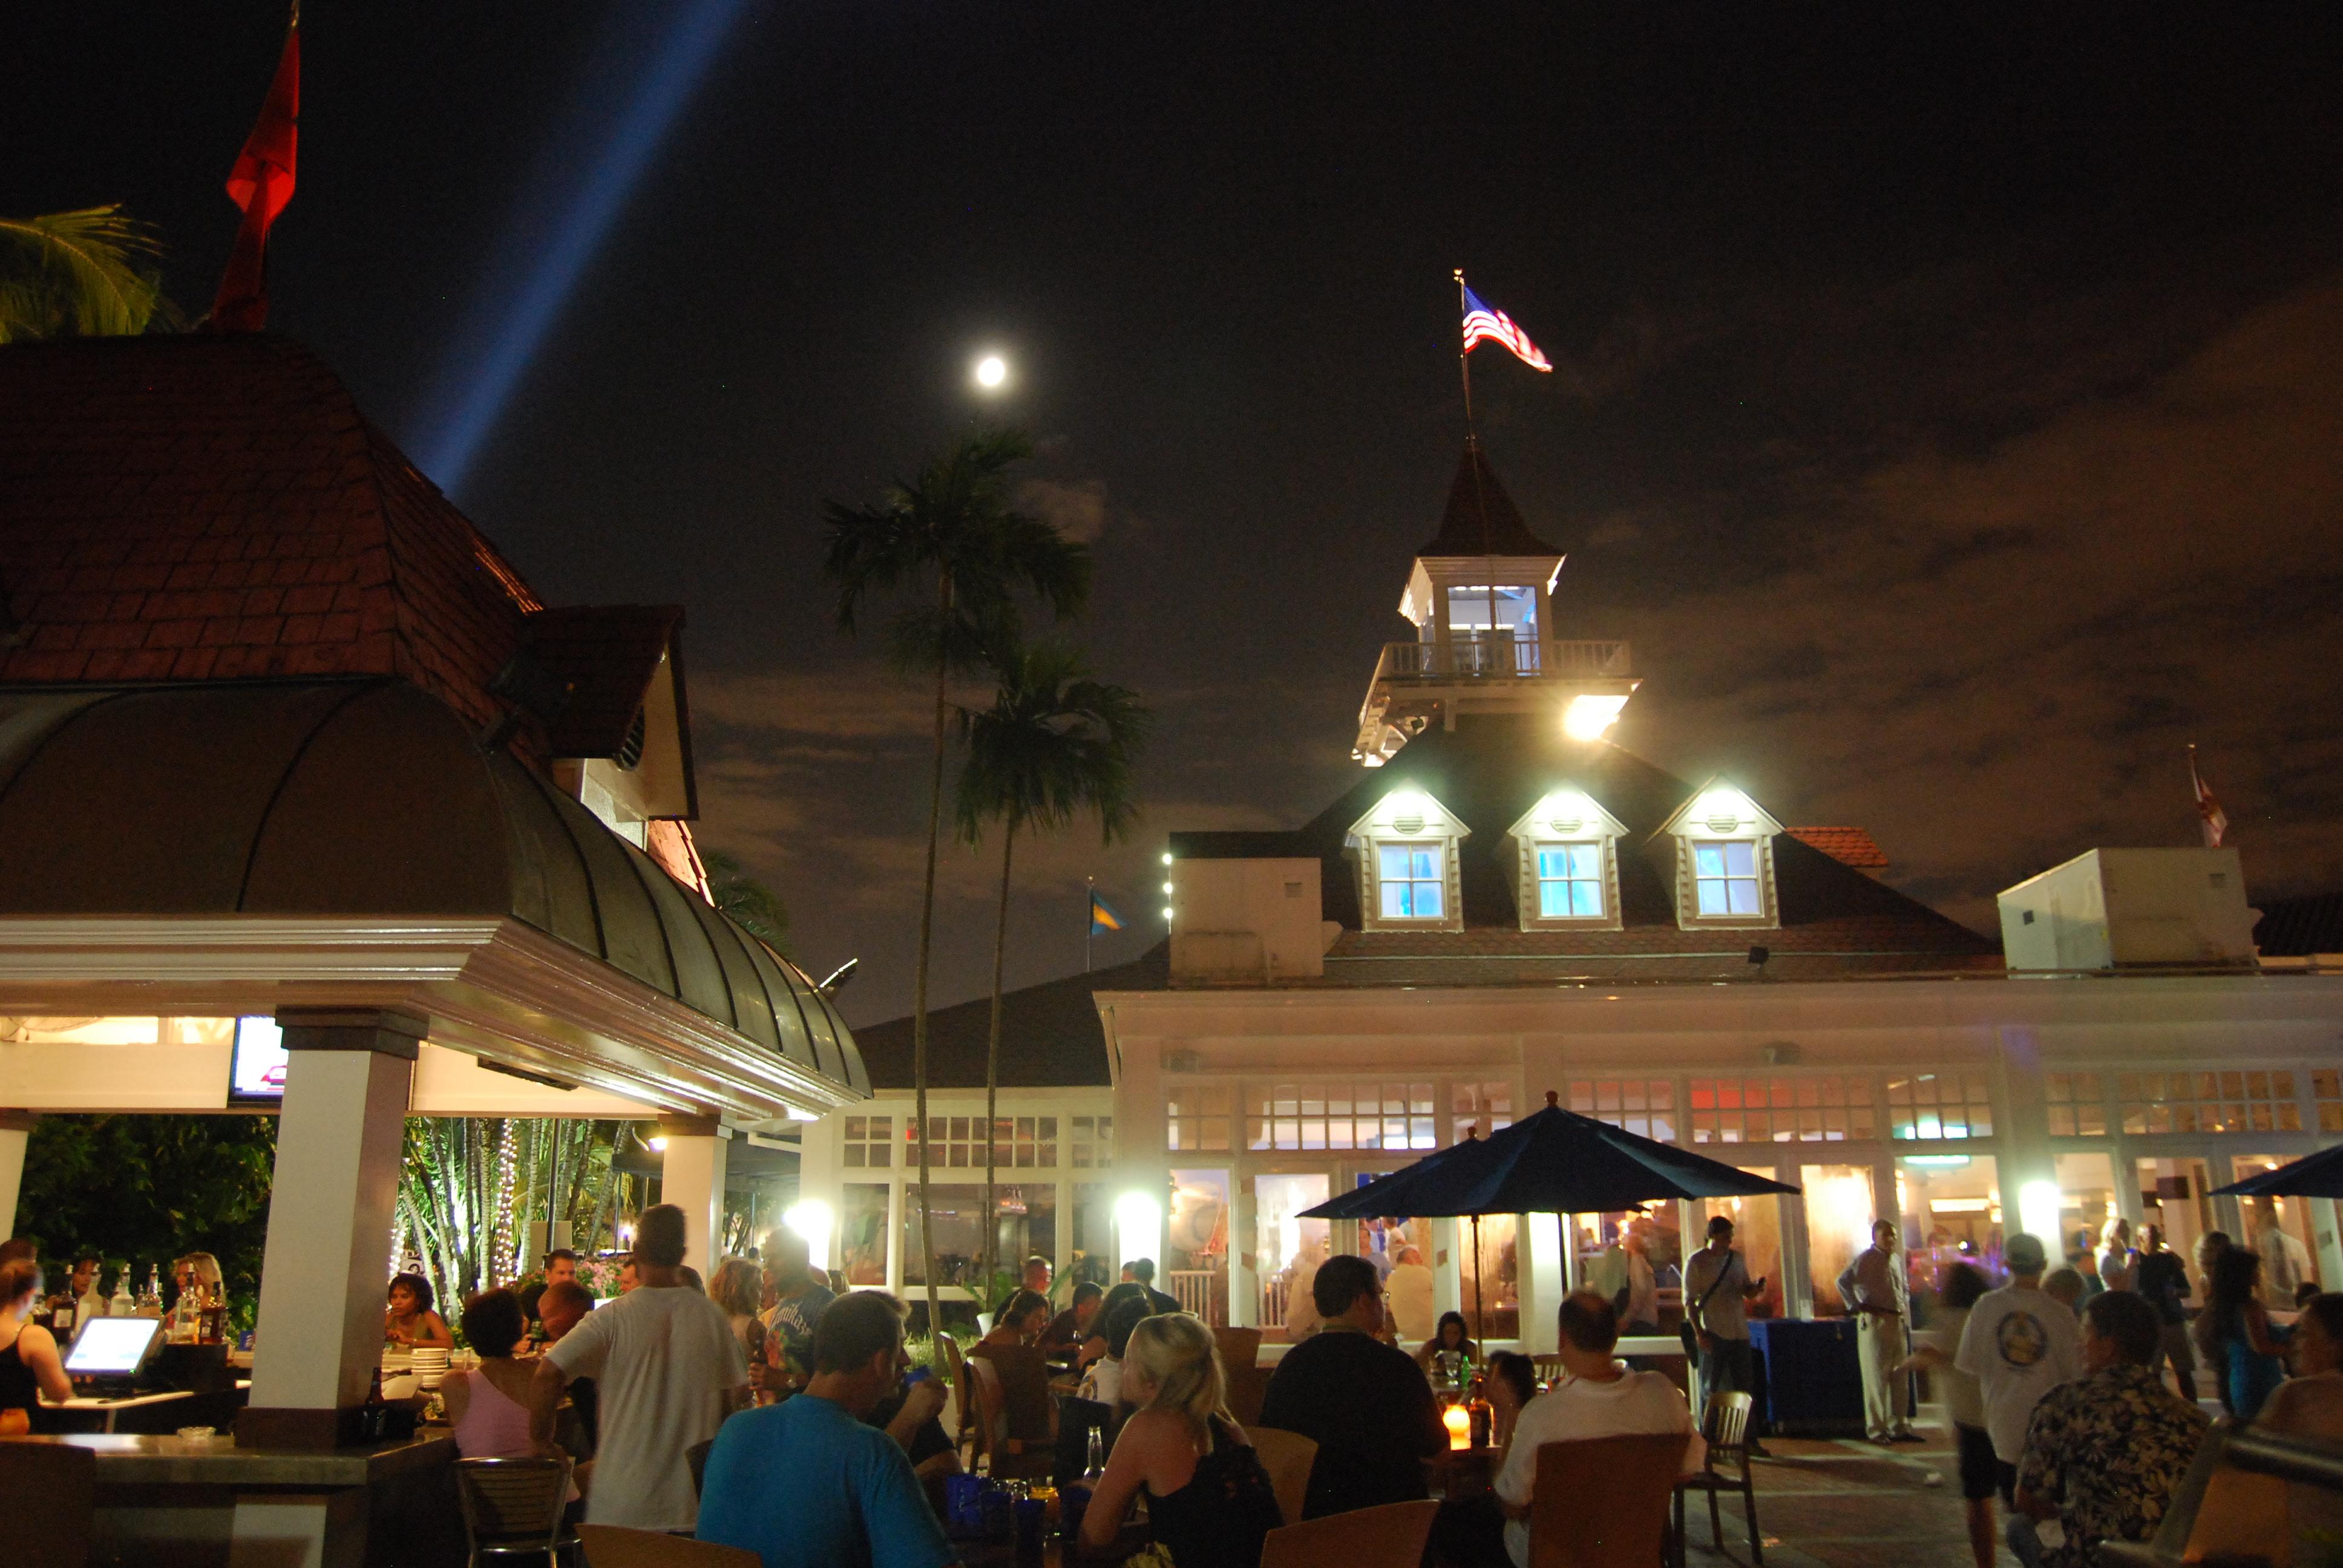 PhotoSPOKD at Bimini Boatyard Bar & Grill